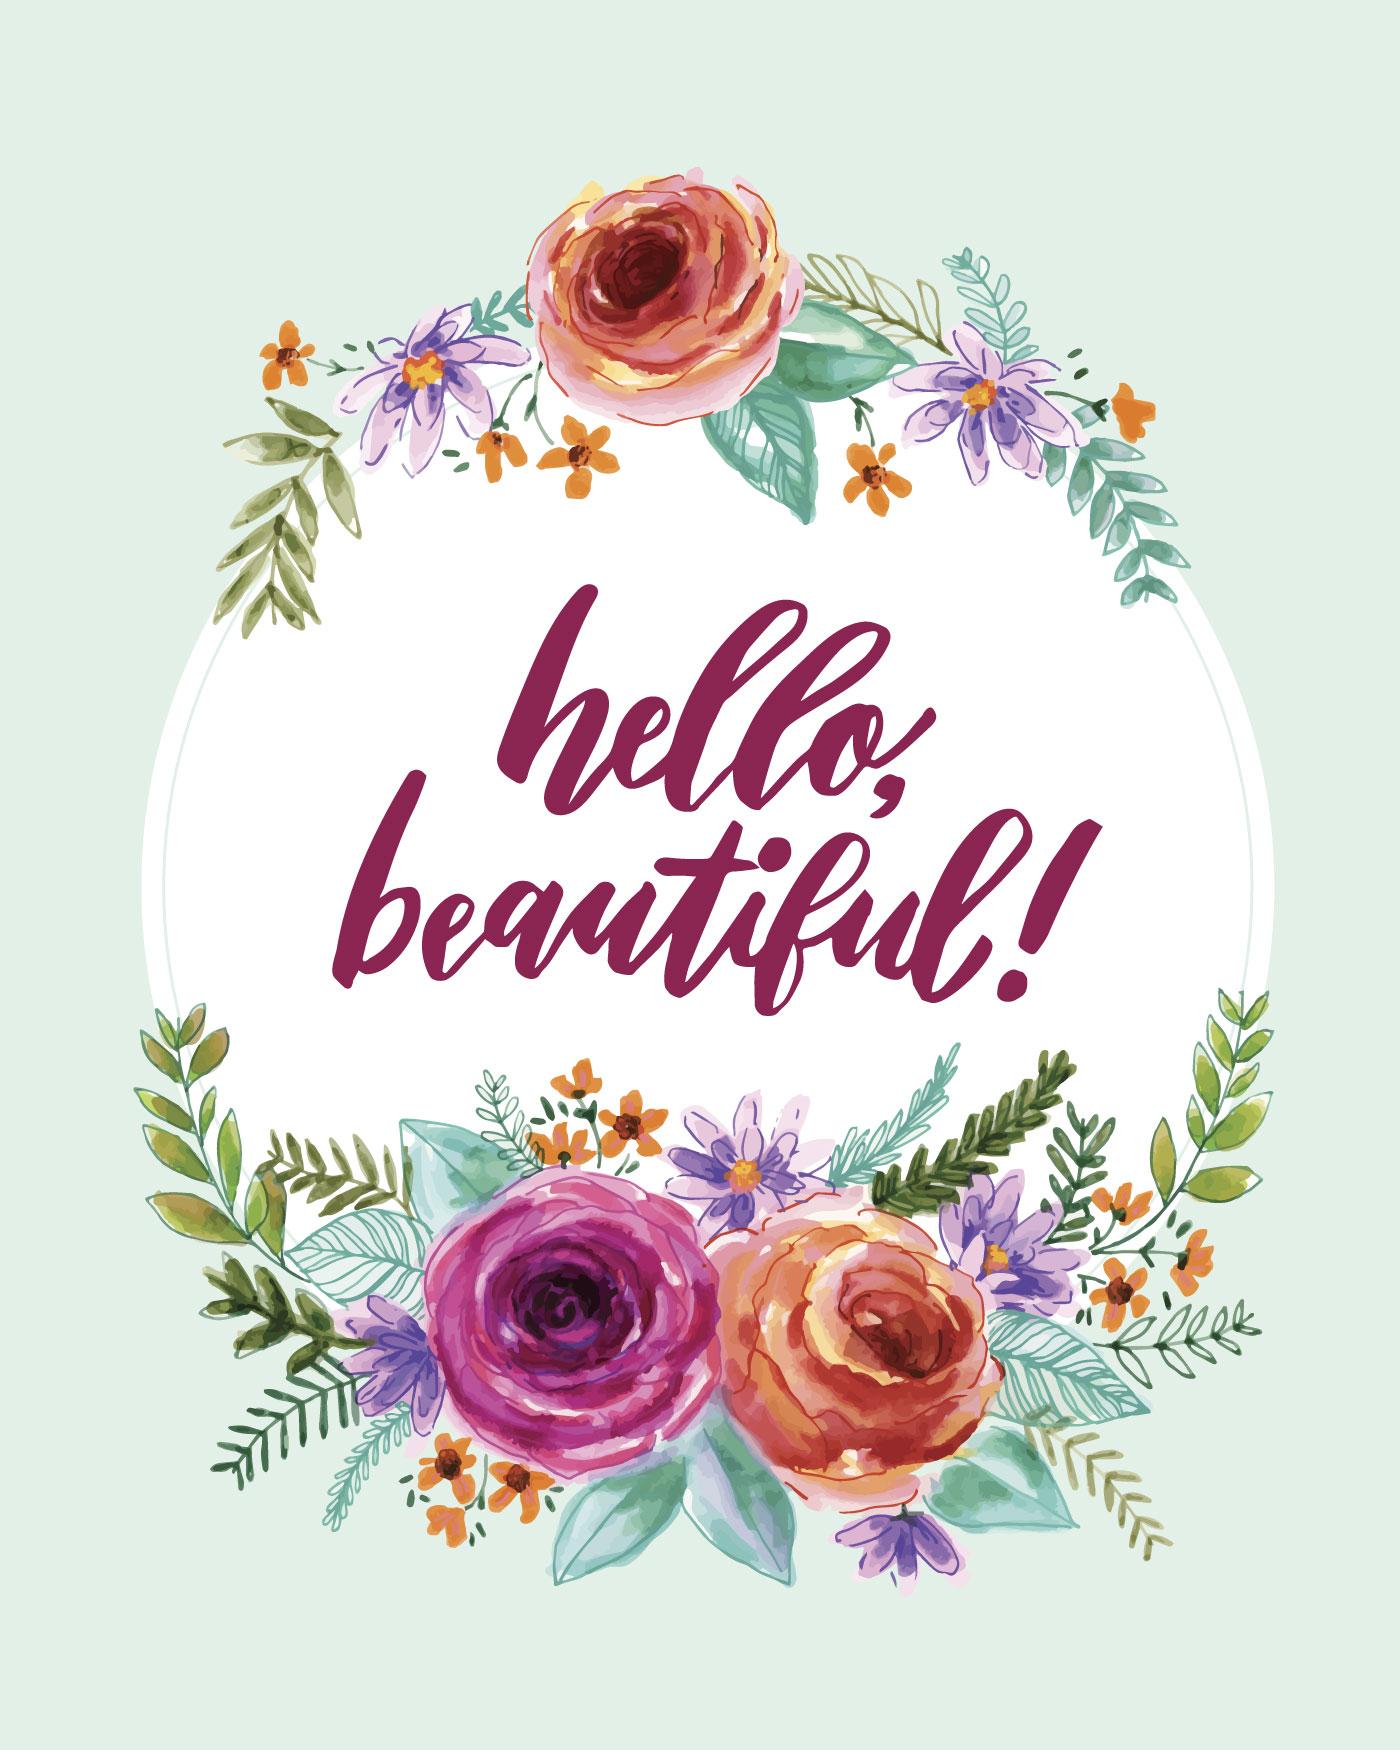 Hello, Beautiful! - Download Free Vectors, Clipart ...